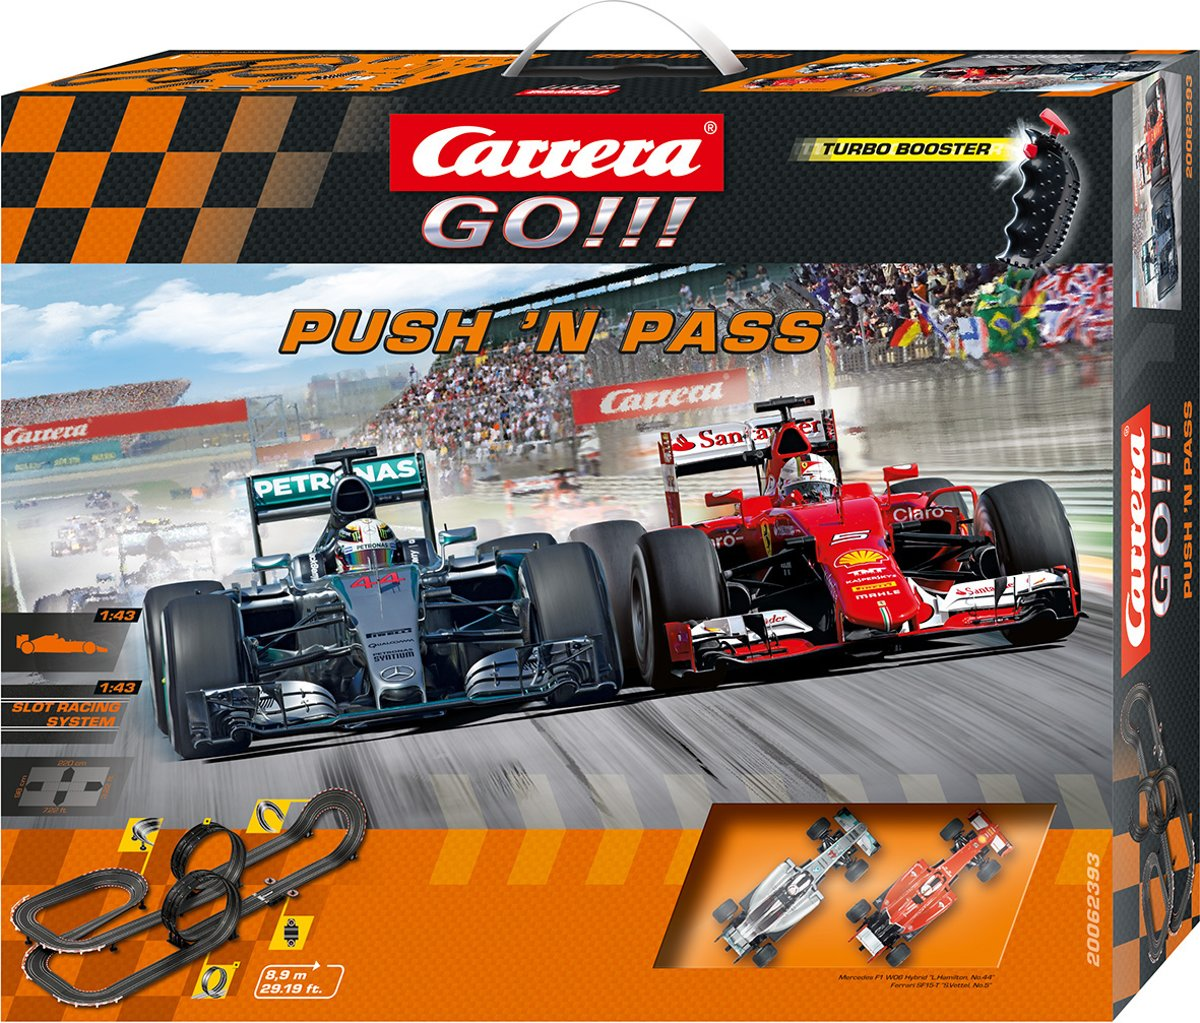 Carrera GO!!! Push